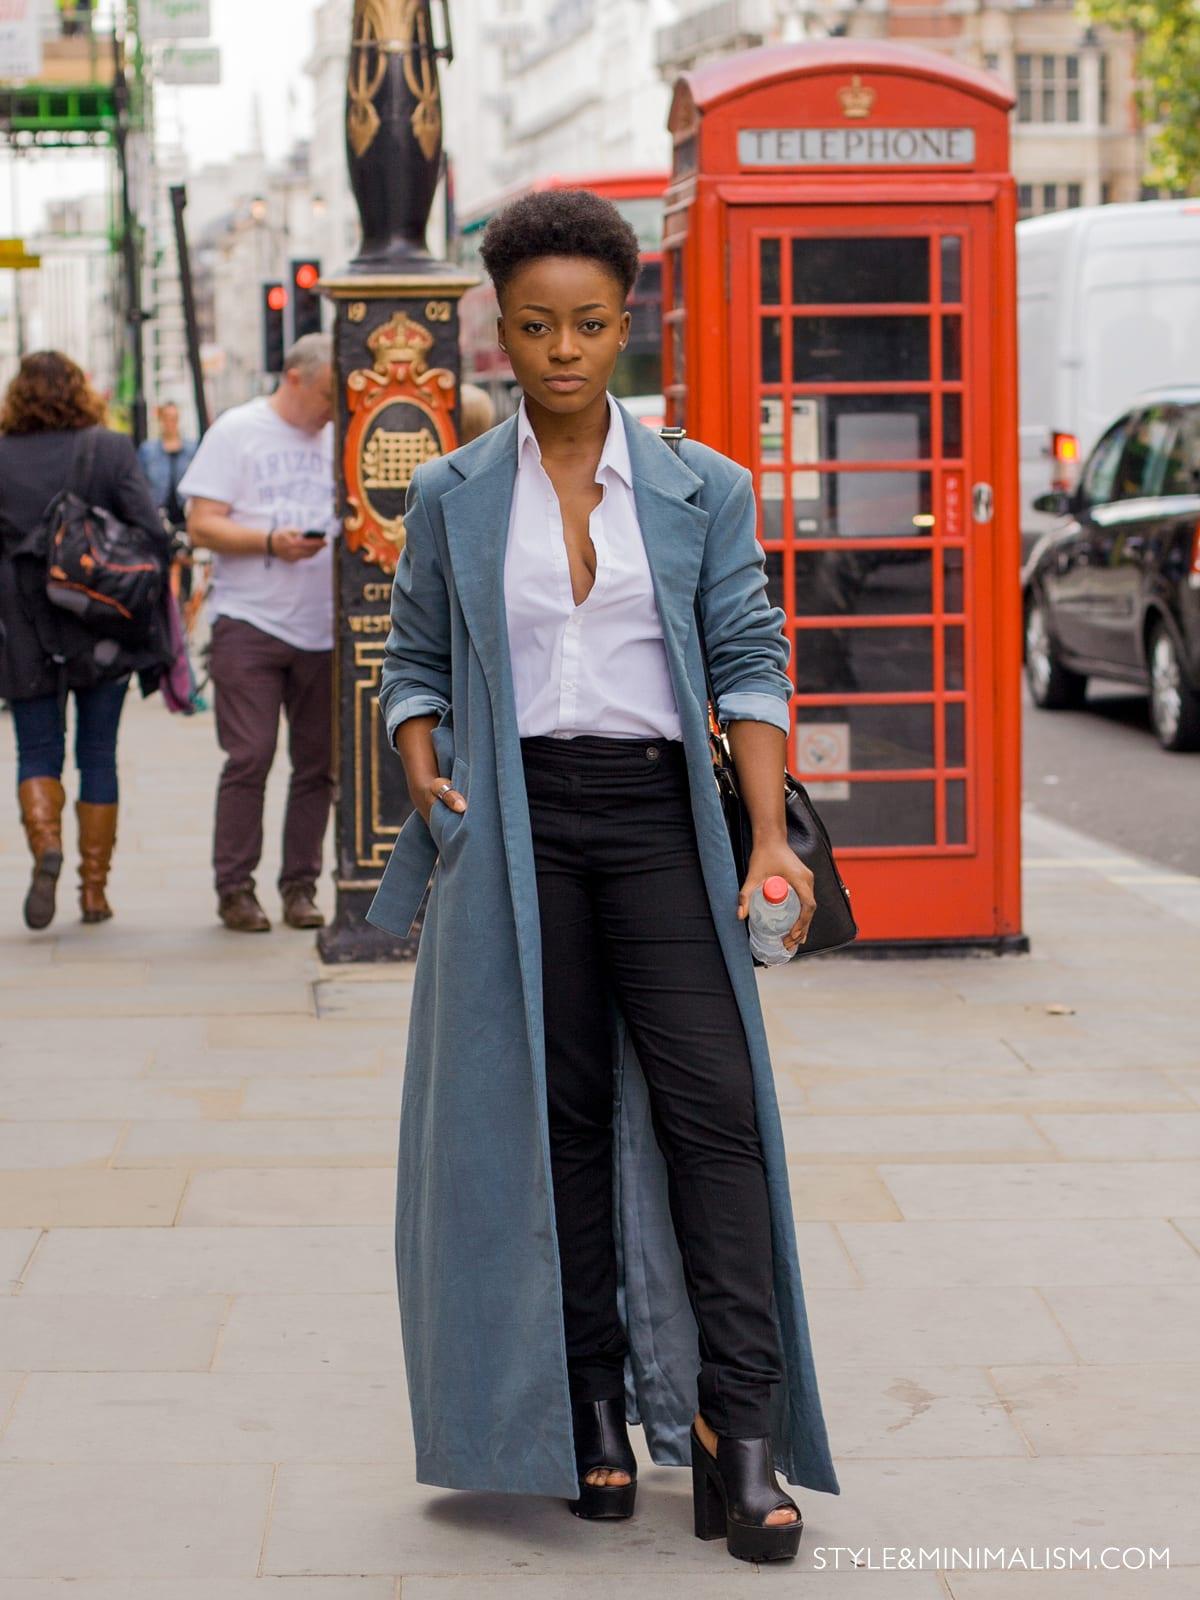 StyleANDMinimalism | LFW SS15 | Street Style | Day 1 | Ruth Misamu